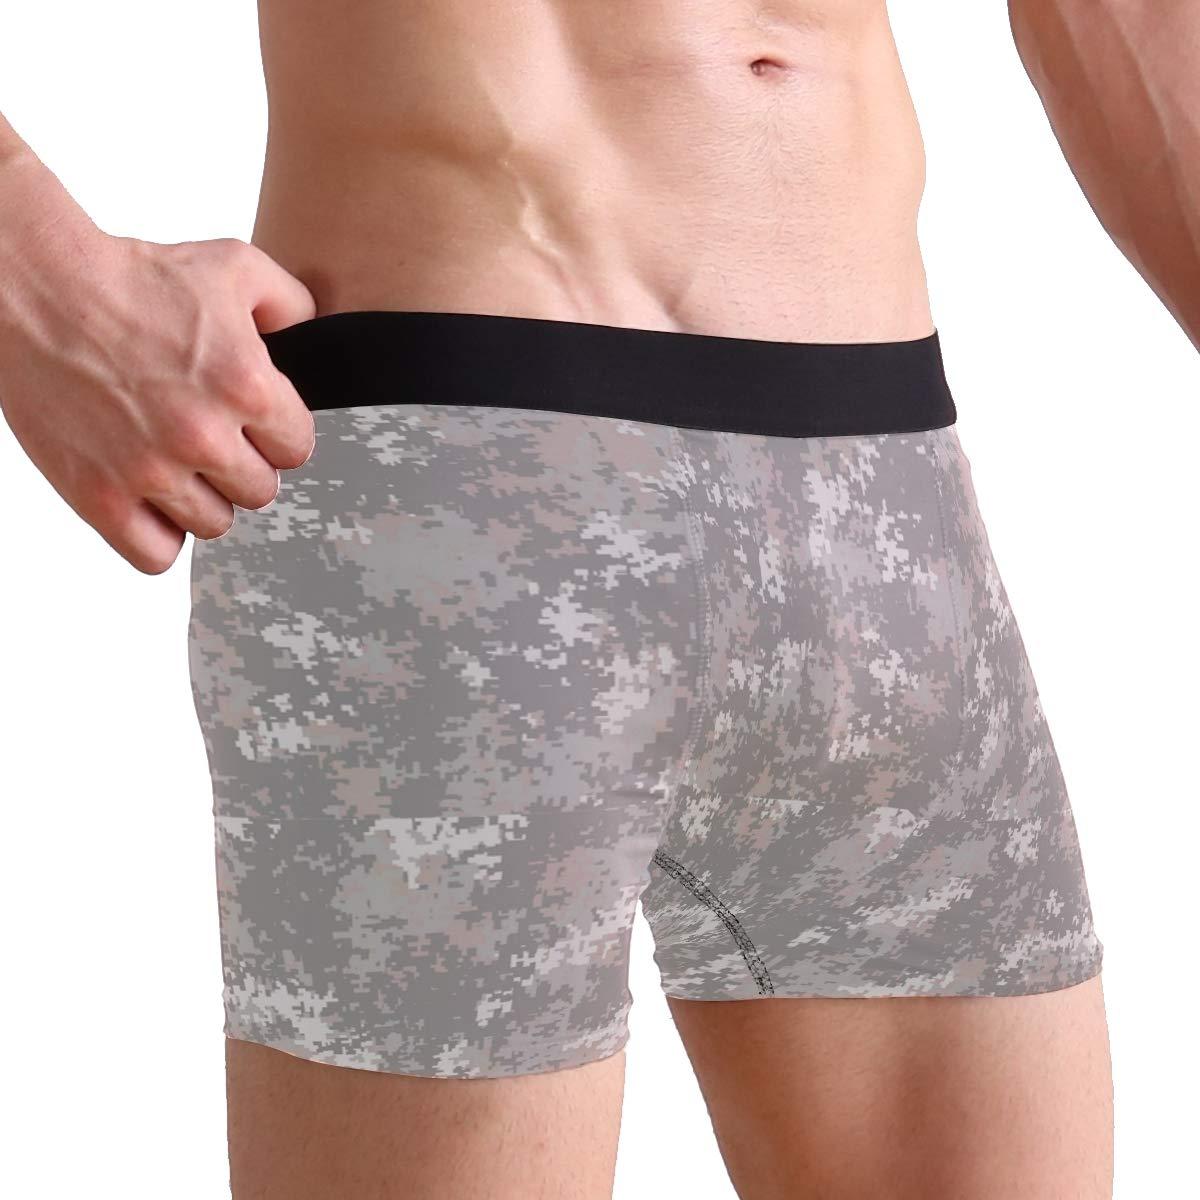 Charlley Lee Mens Soft Breathable Silver Camo Desert Underwear Boxer Briefs